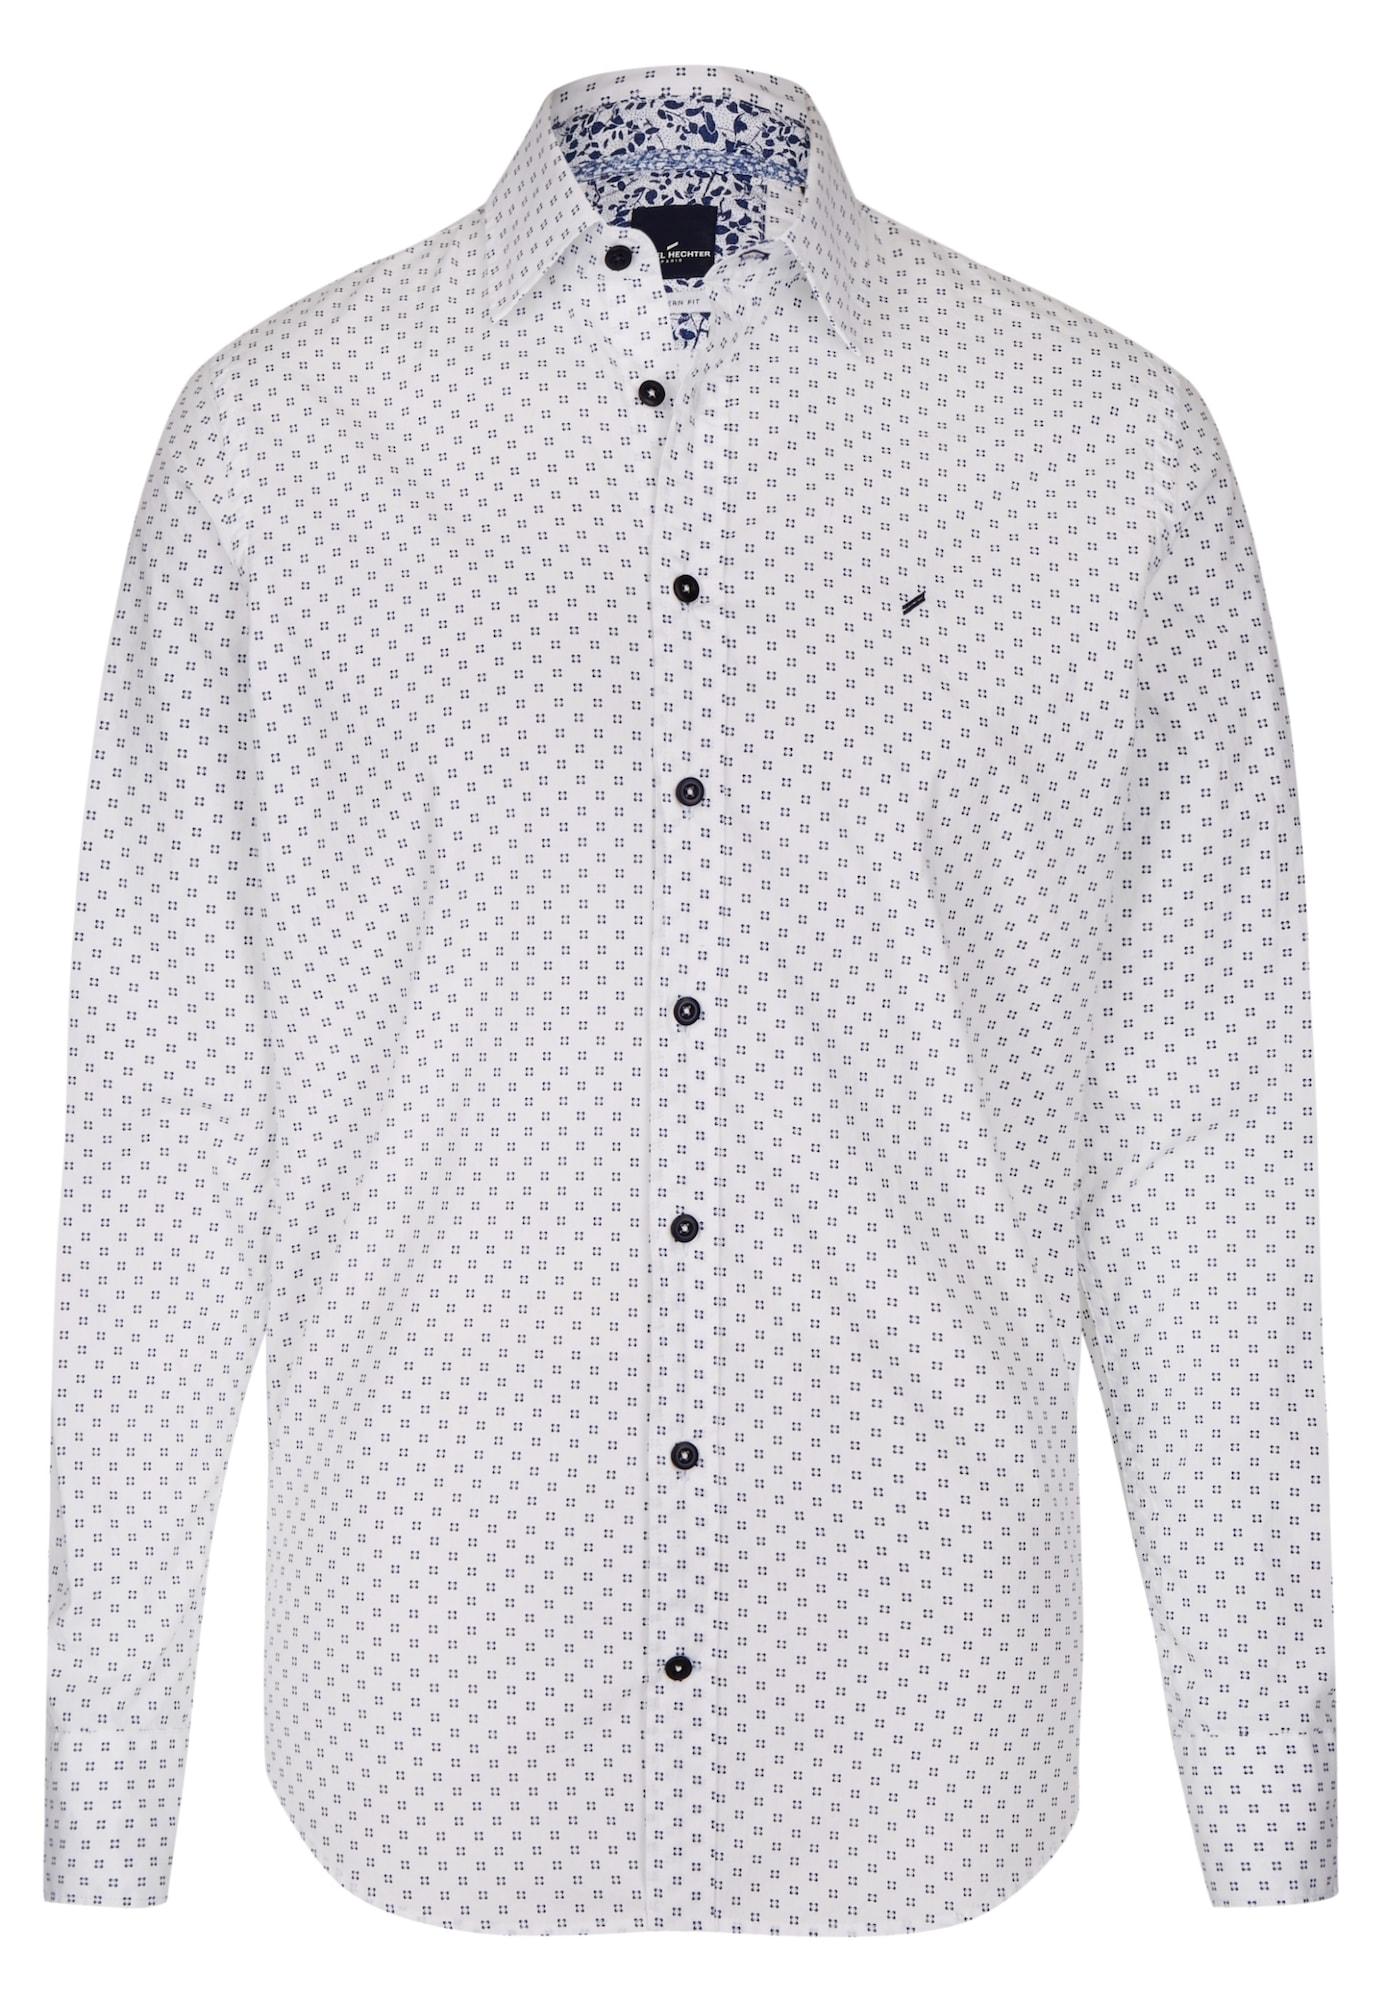 Hemd   Bekleidung > Hemden > Sonstige Hemden   Kobaltblau - Weiß   Daniel Hechter